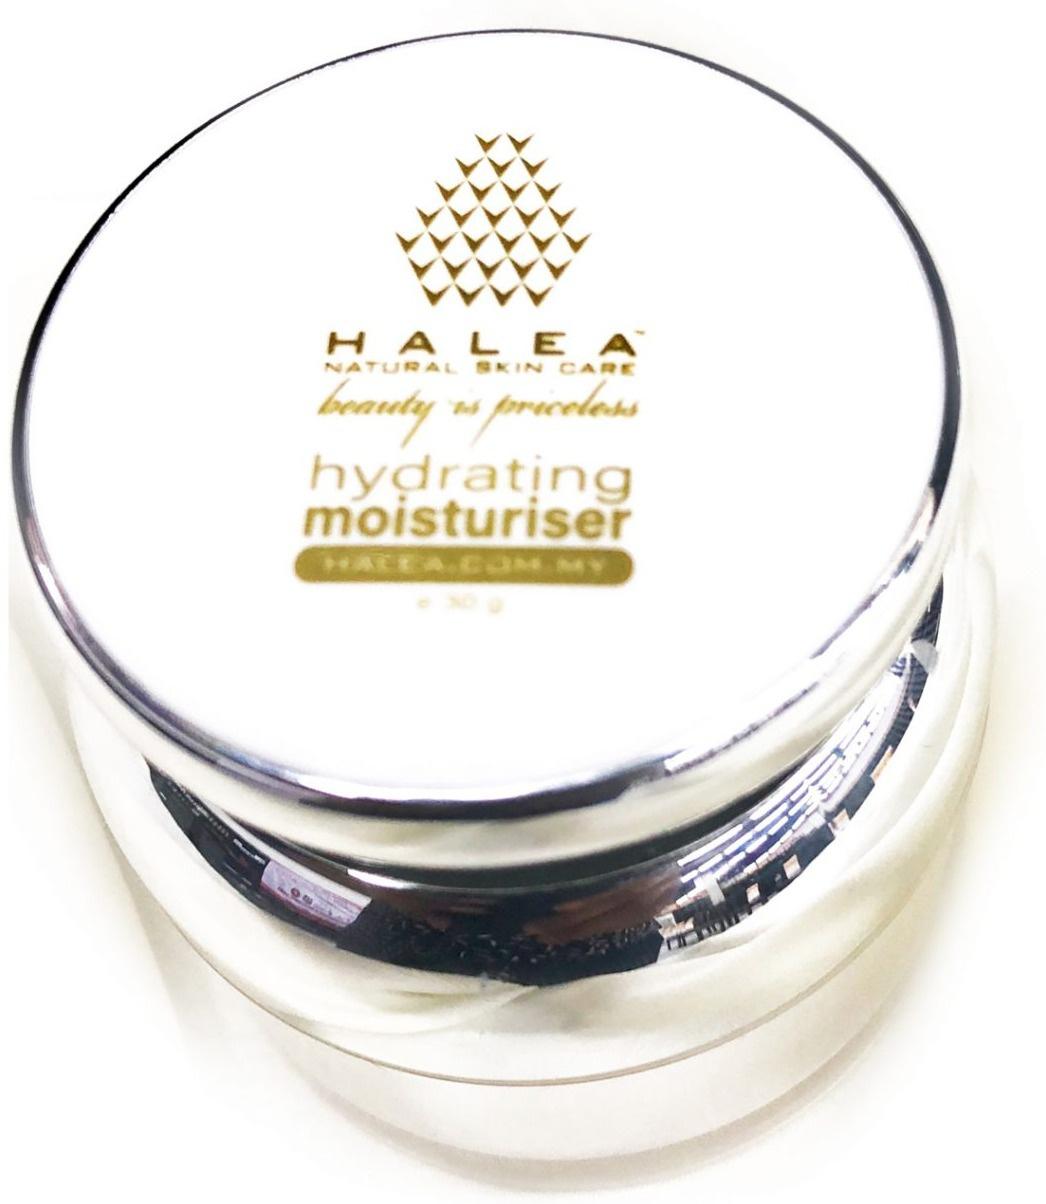 HALEA Hydrating Moisturiser